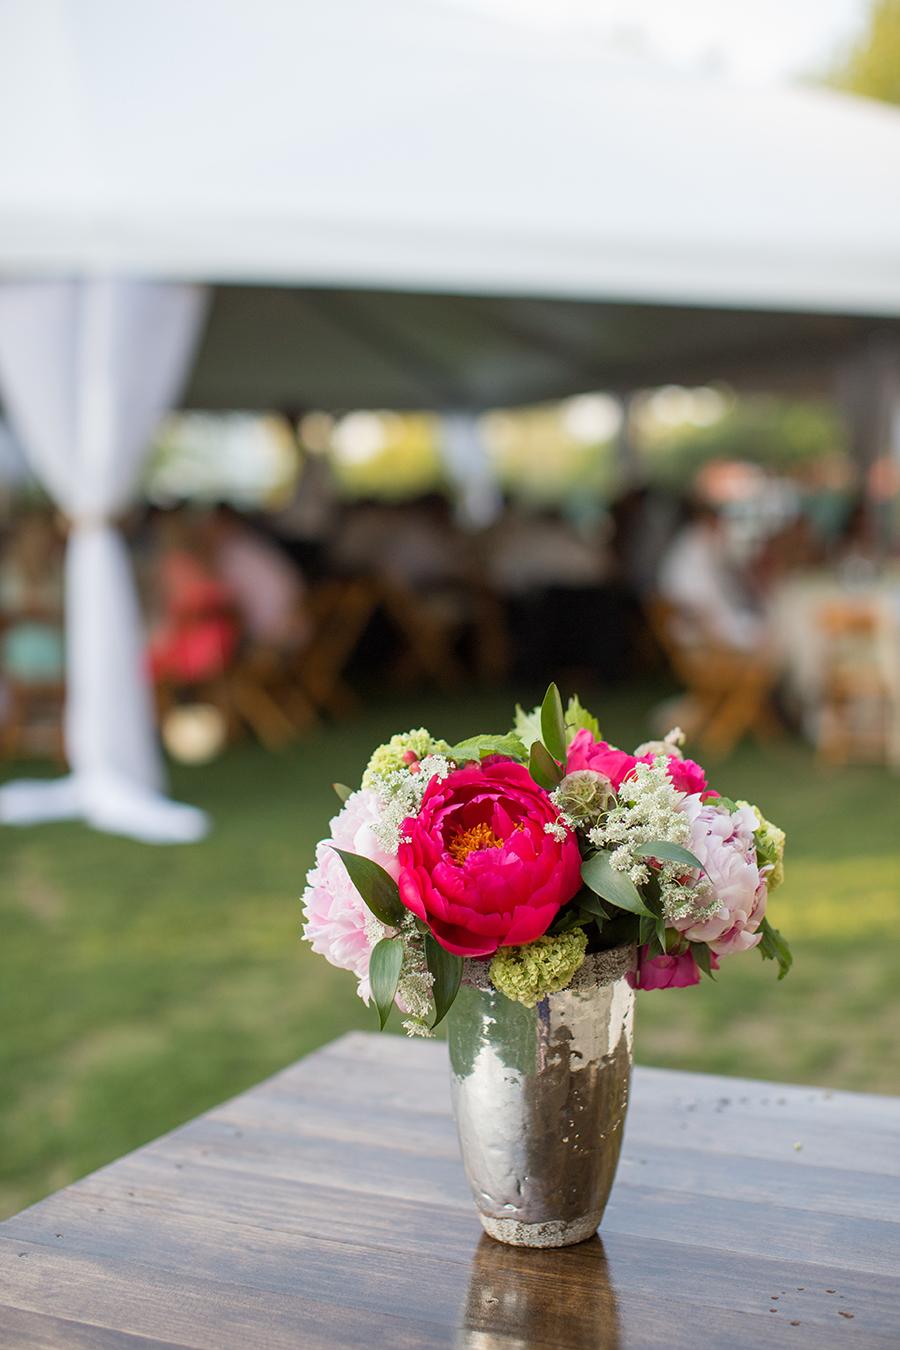 wedding_rentals8.jpg